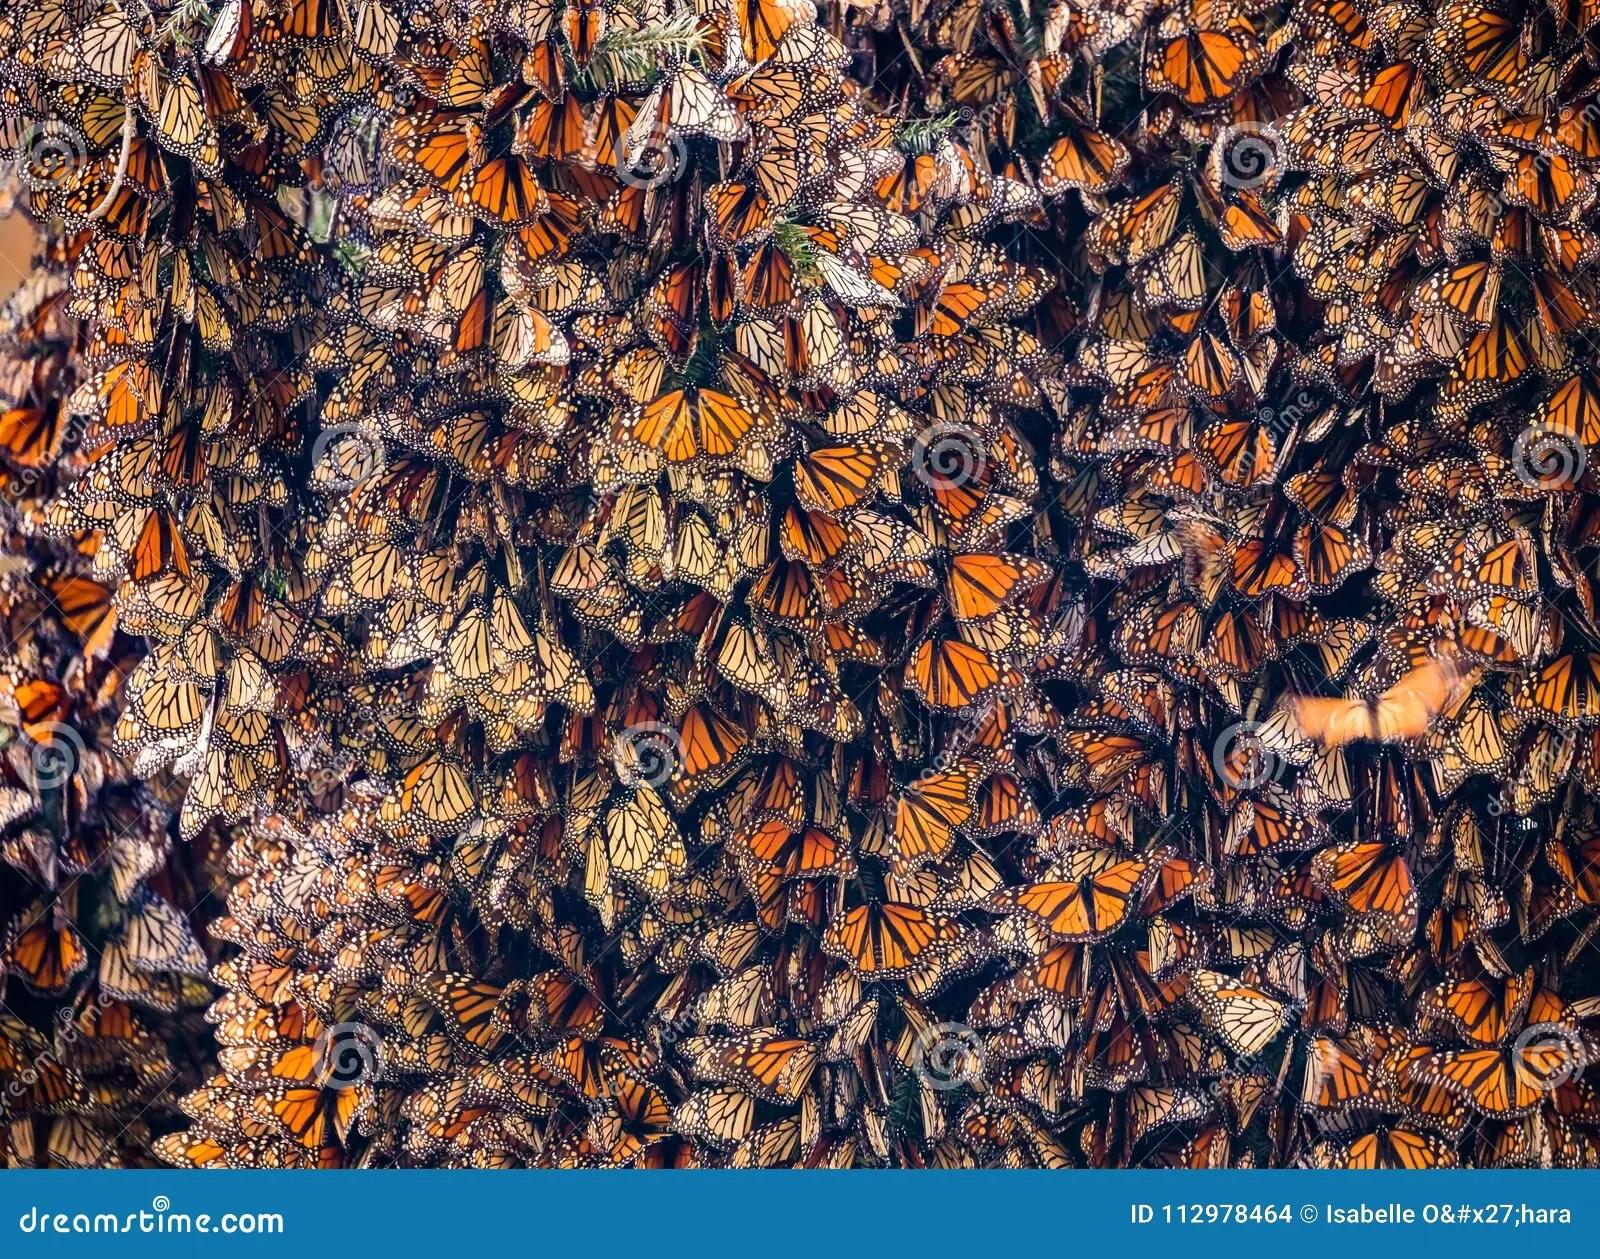 Kalaeidoscope Of Monarch Butterflies Danaus Plexippus